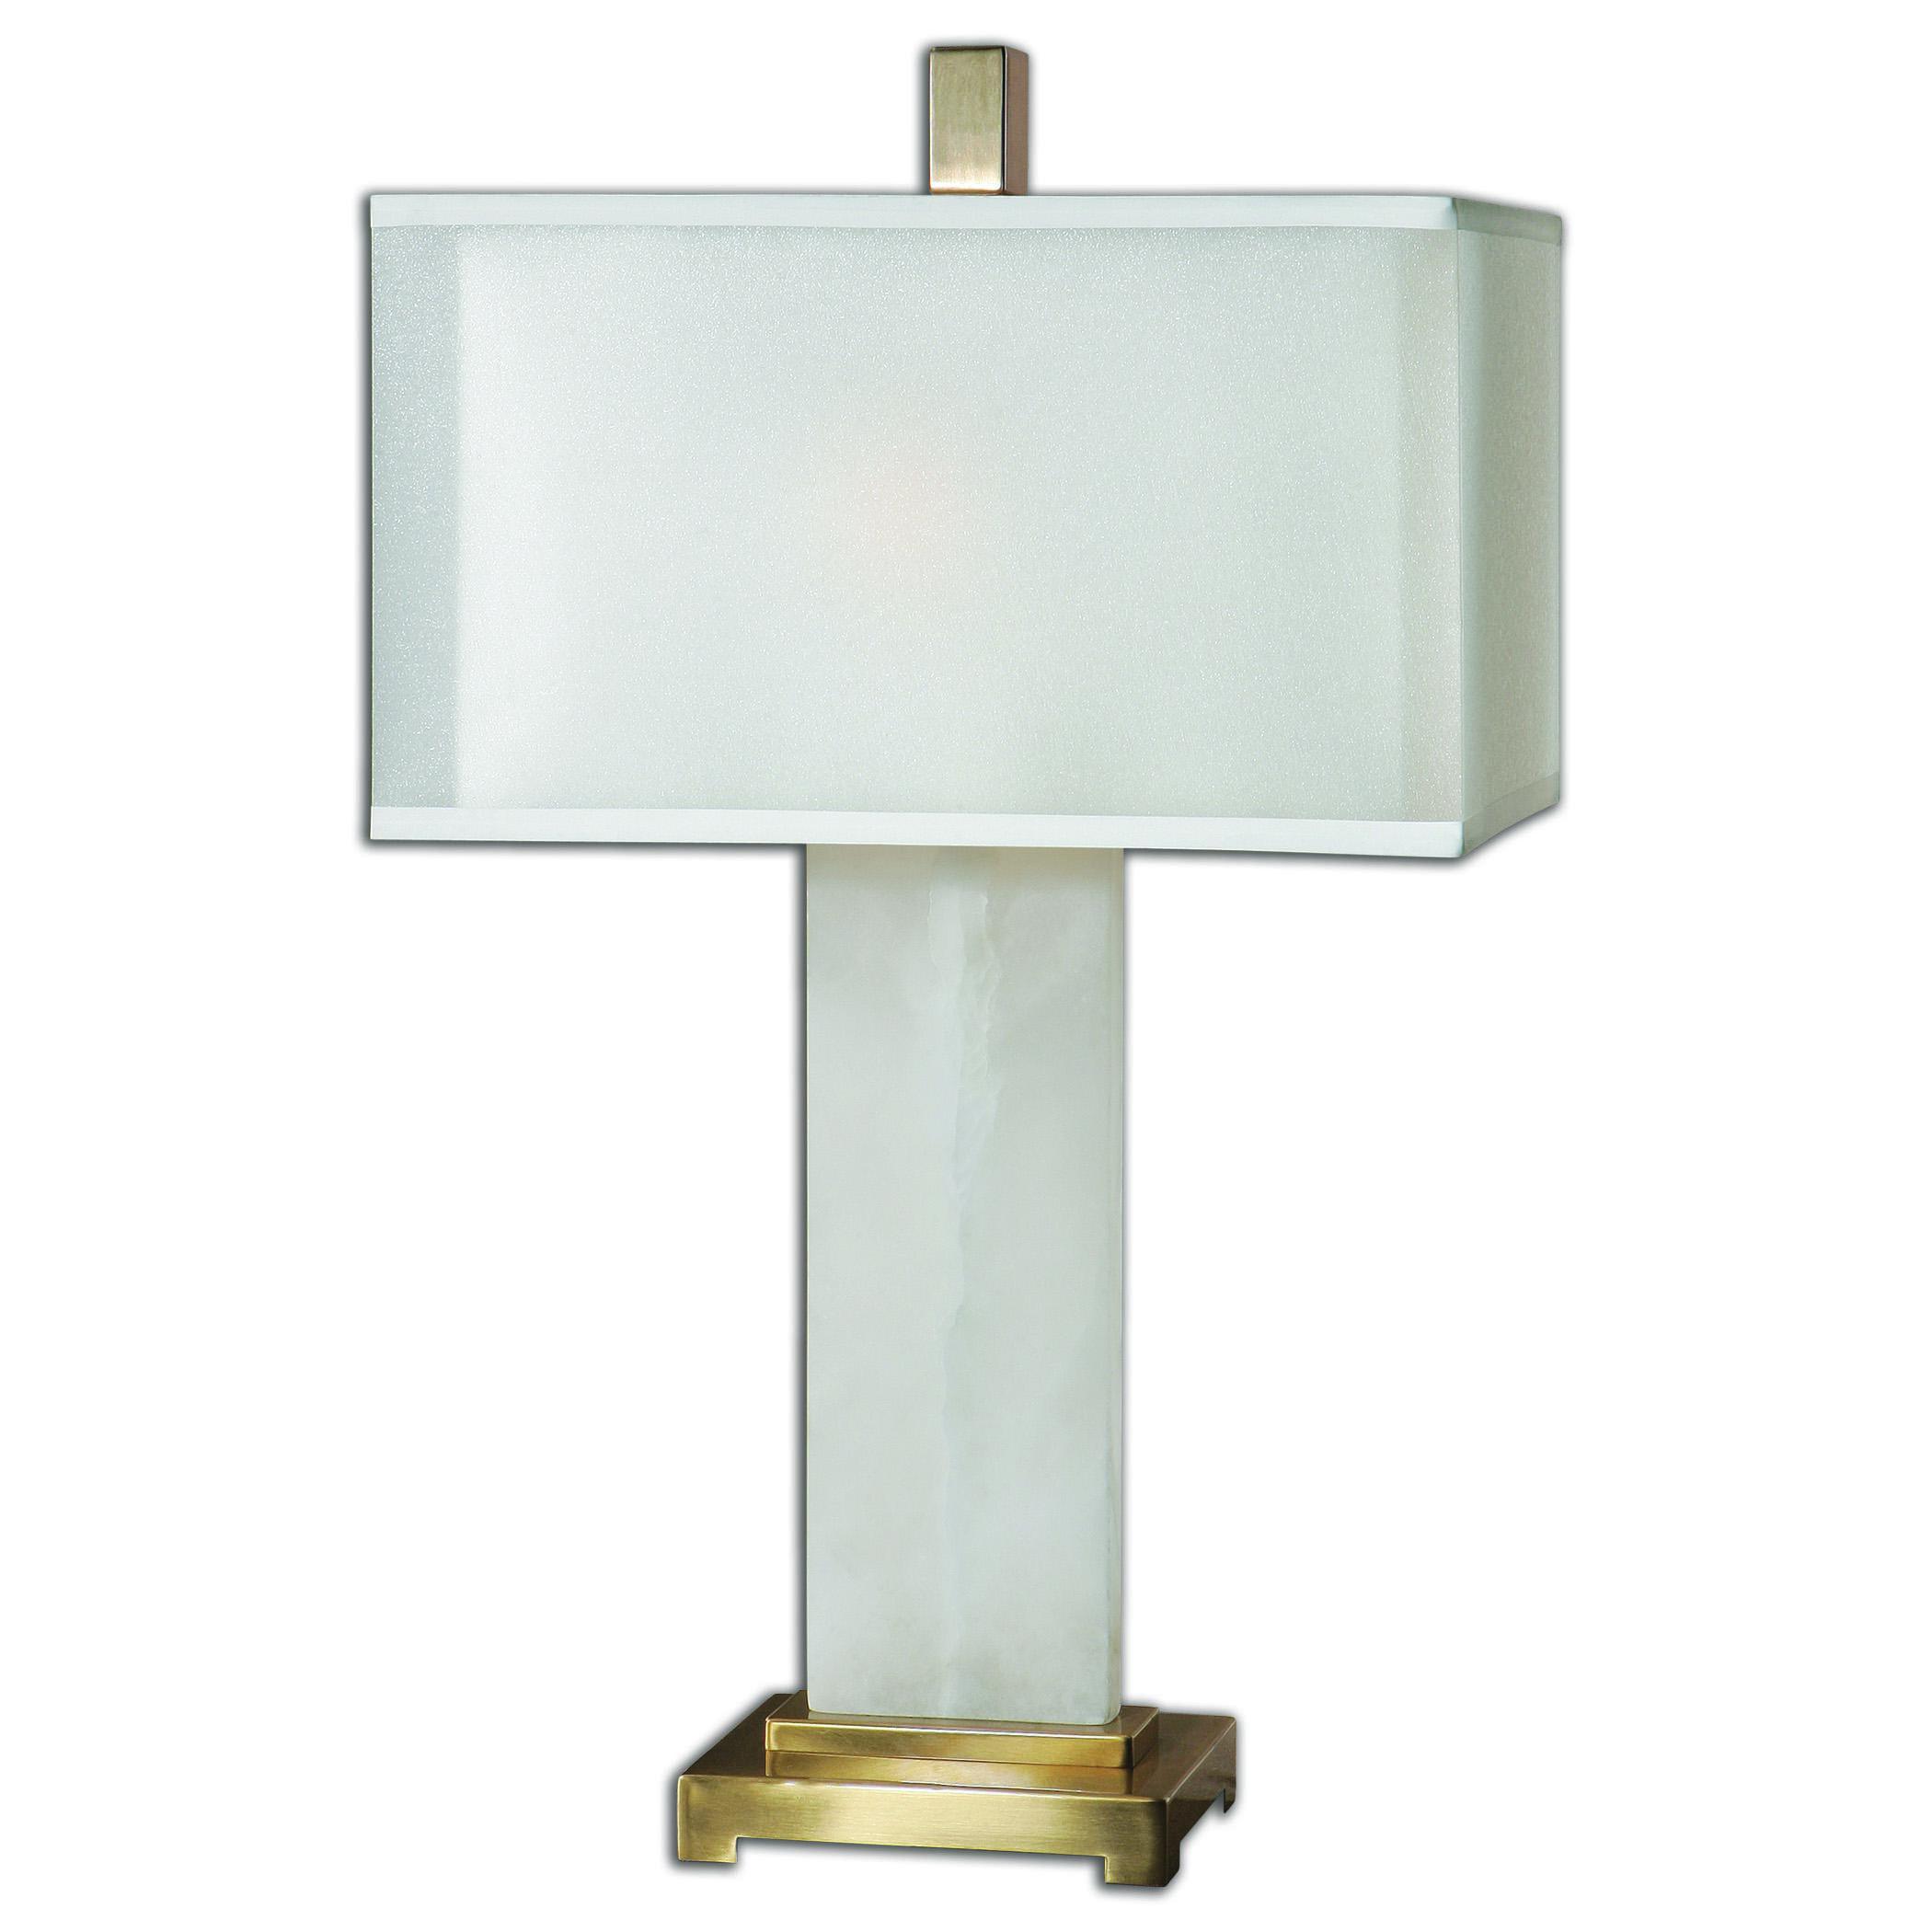 Athanas alabaster Lamp